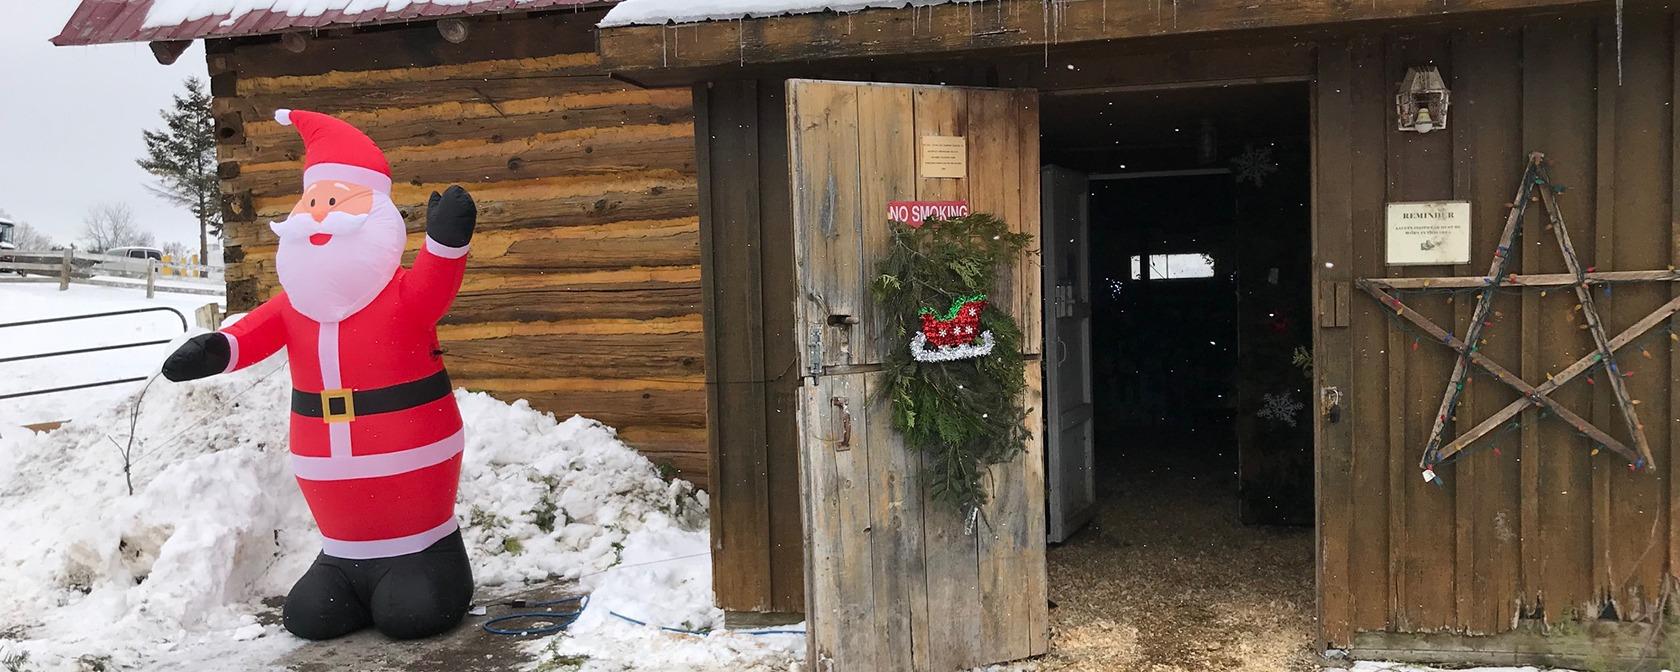 inflatable santa welcomes guests at the barn